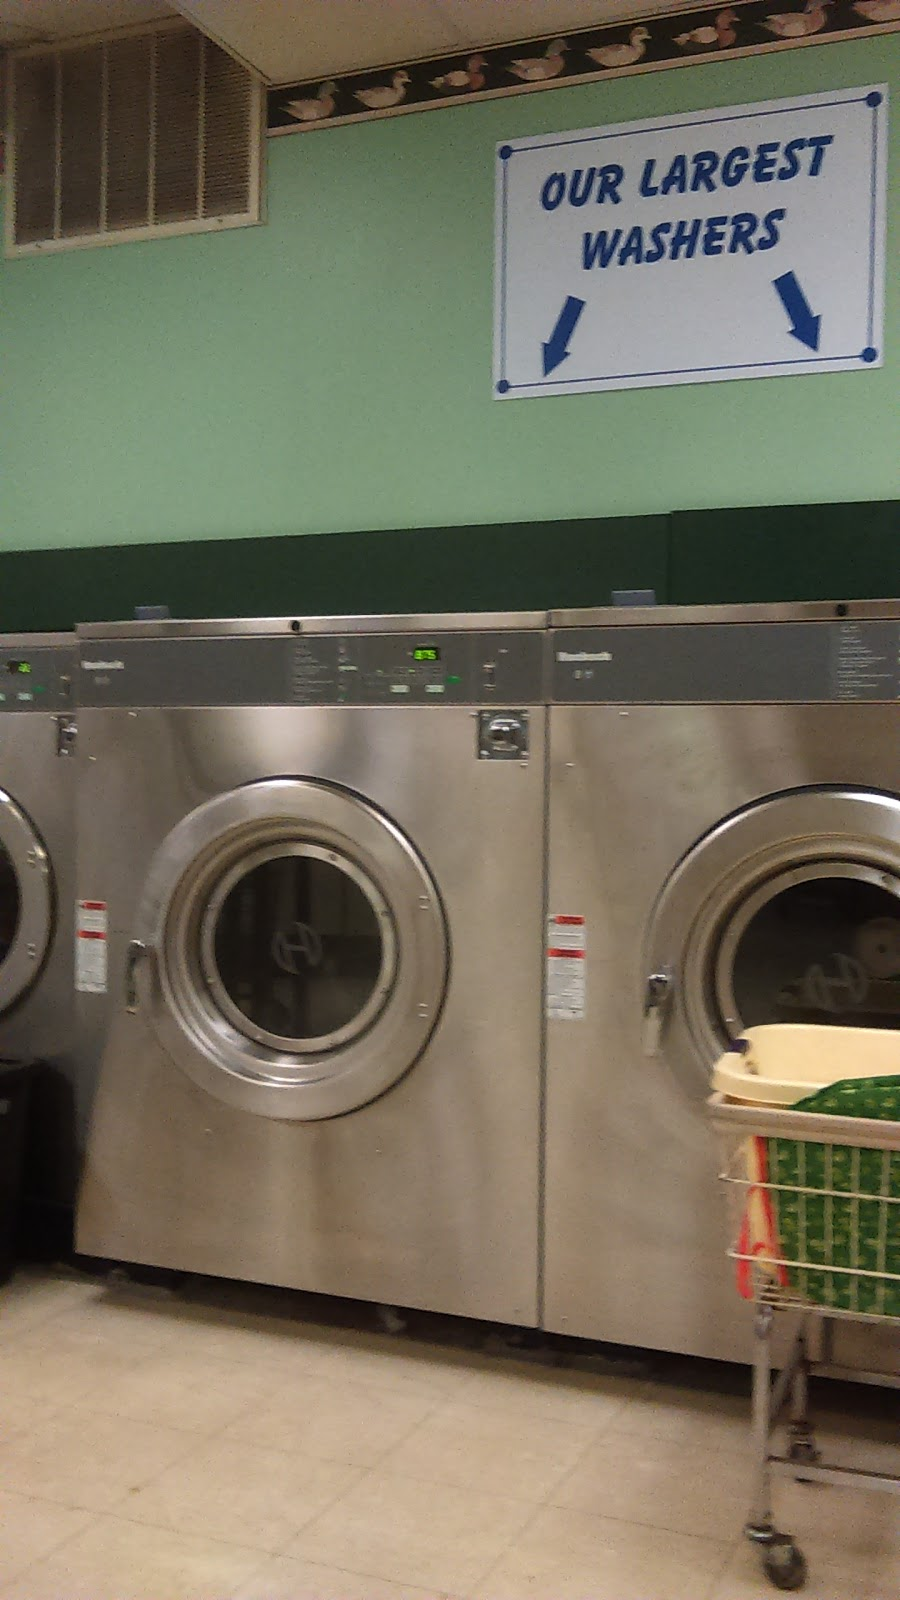 Major Kleen Laundromat - laundry    Photo 6 of 7   Address: 4044 Airport Hwy, Toledo, OH 43615, USA   Phone: (419) 381-0617